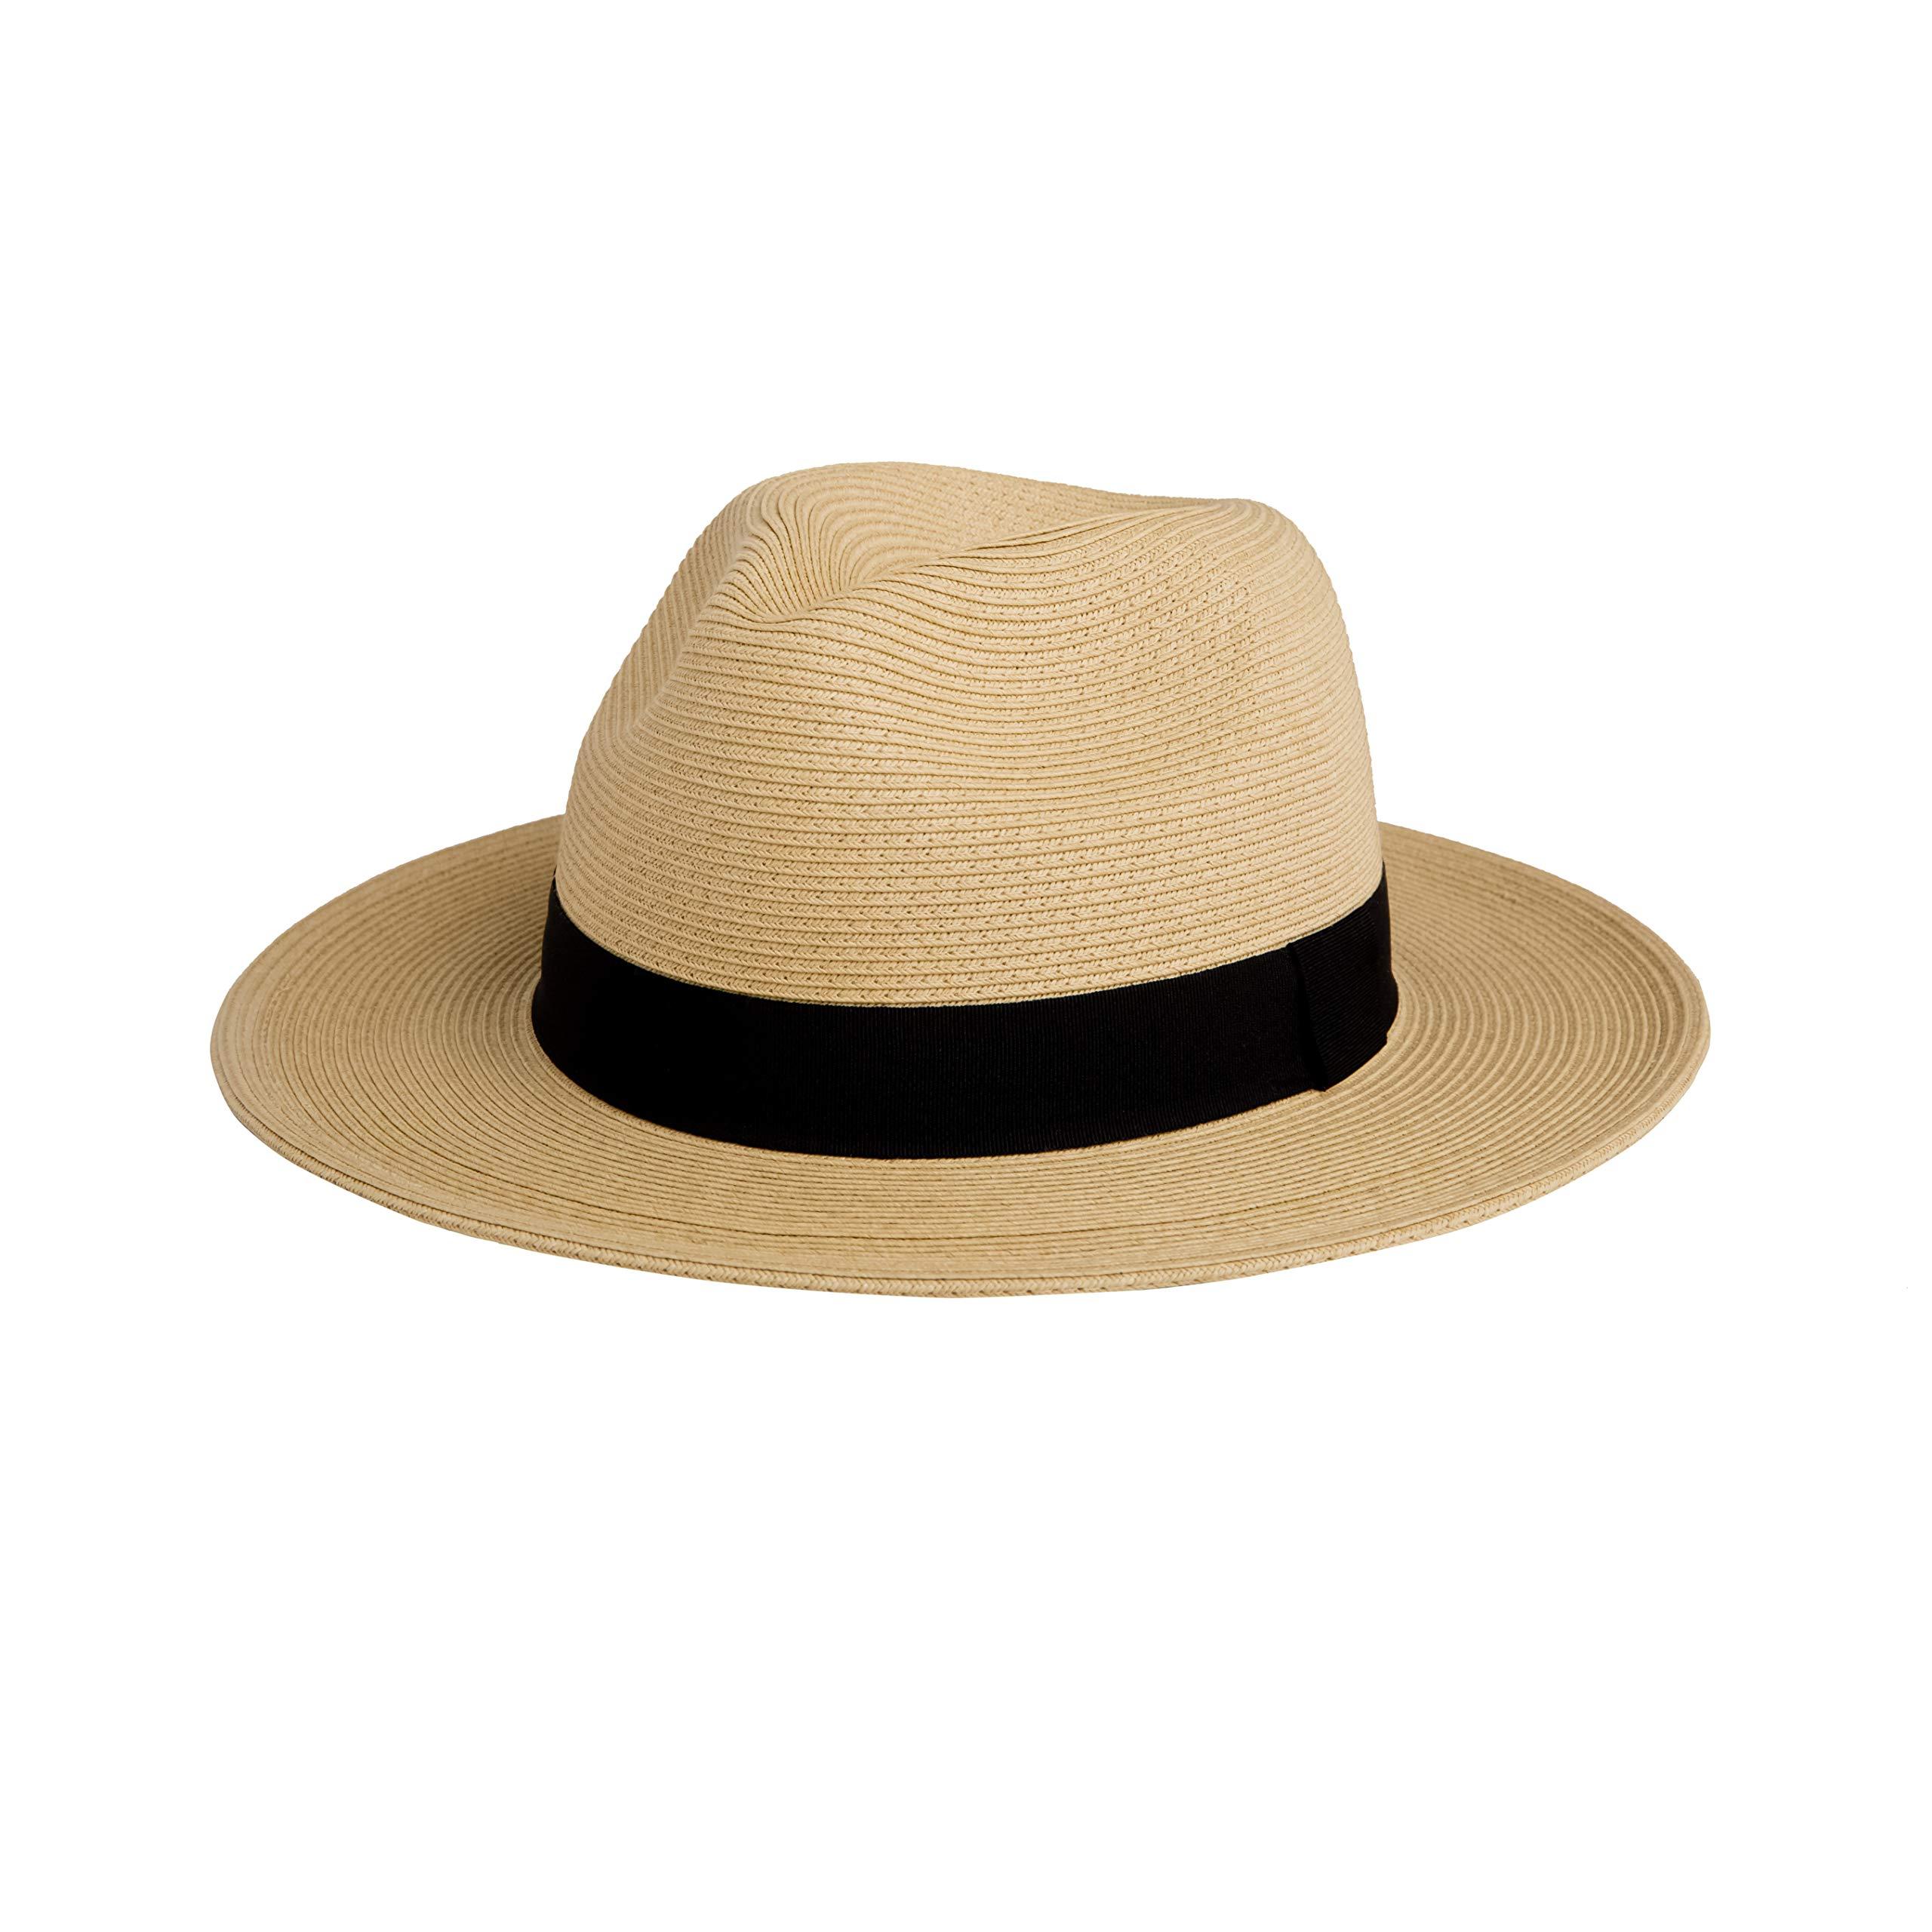 Pineapple&Star Sun Straw Fedora Beach Hat Fine Braid UPF50+ for Both Women Men (Medium, Beige) by Pineapple&Star Hat